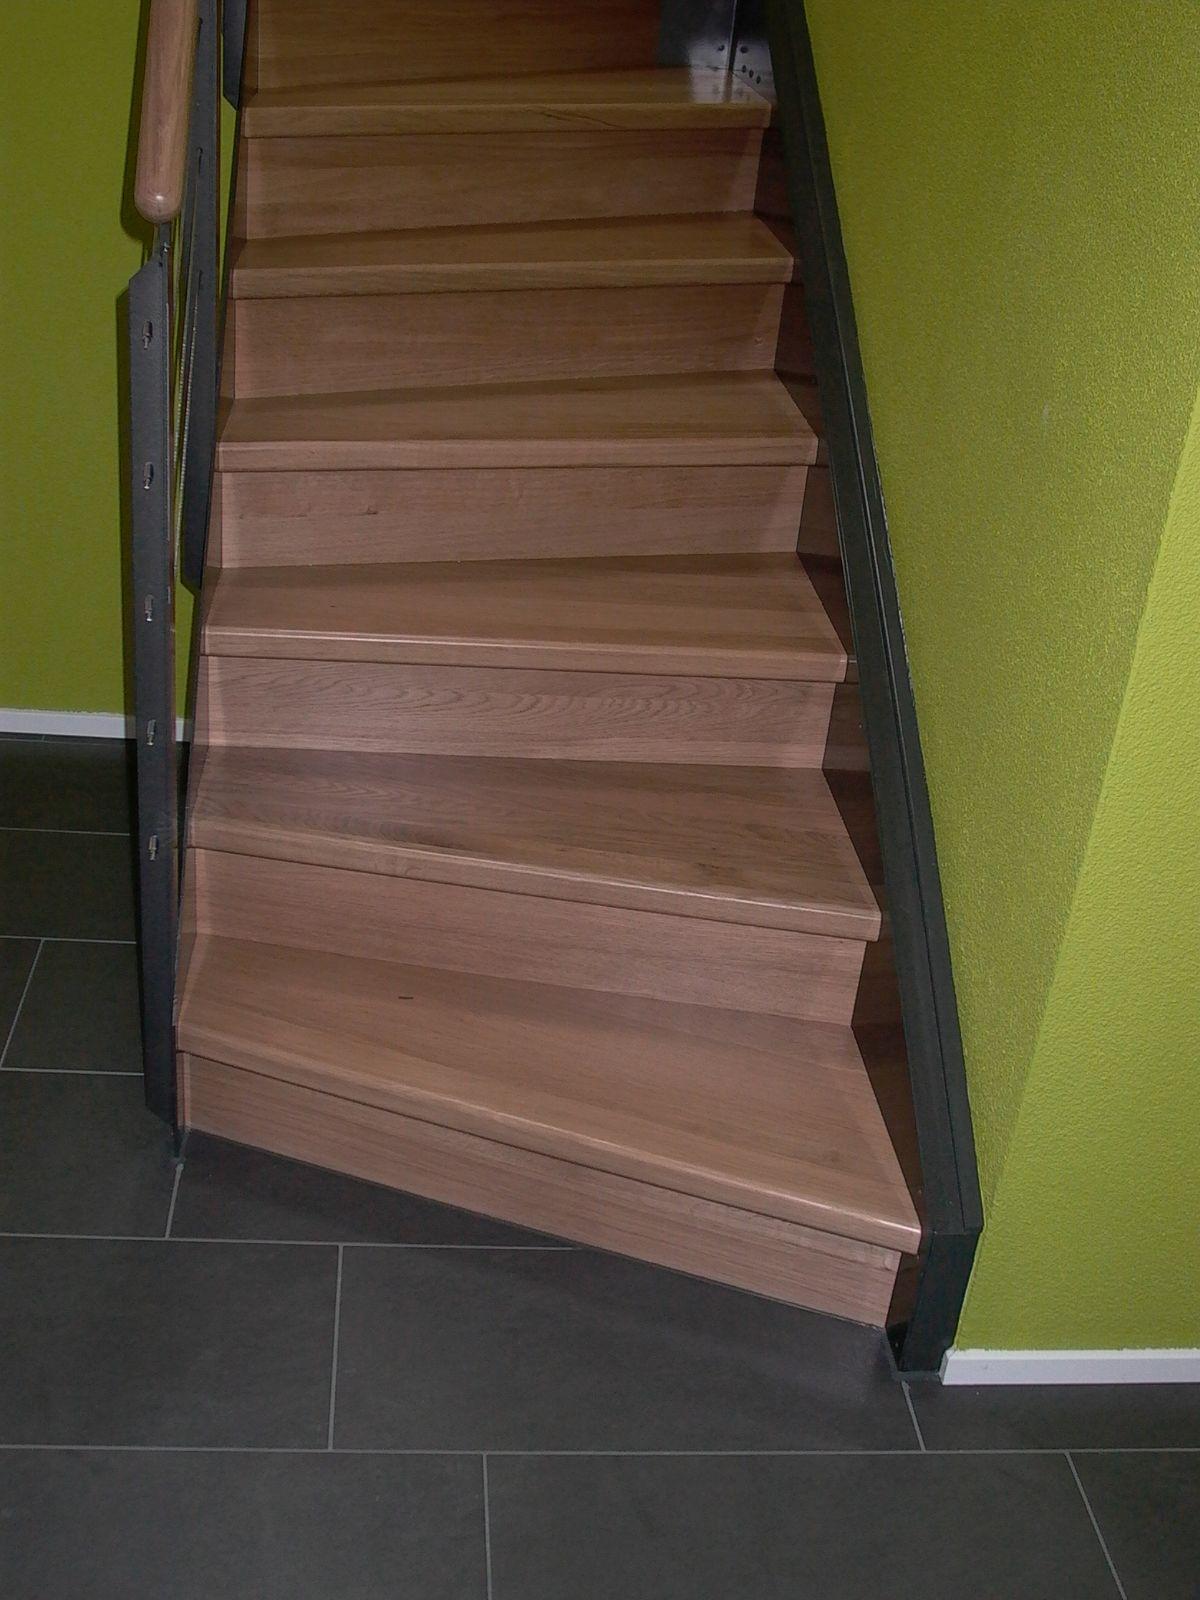 Stair Image 380